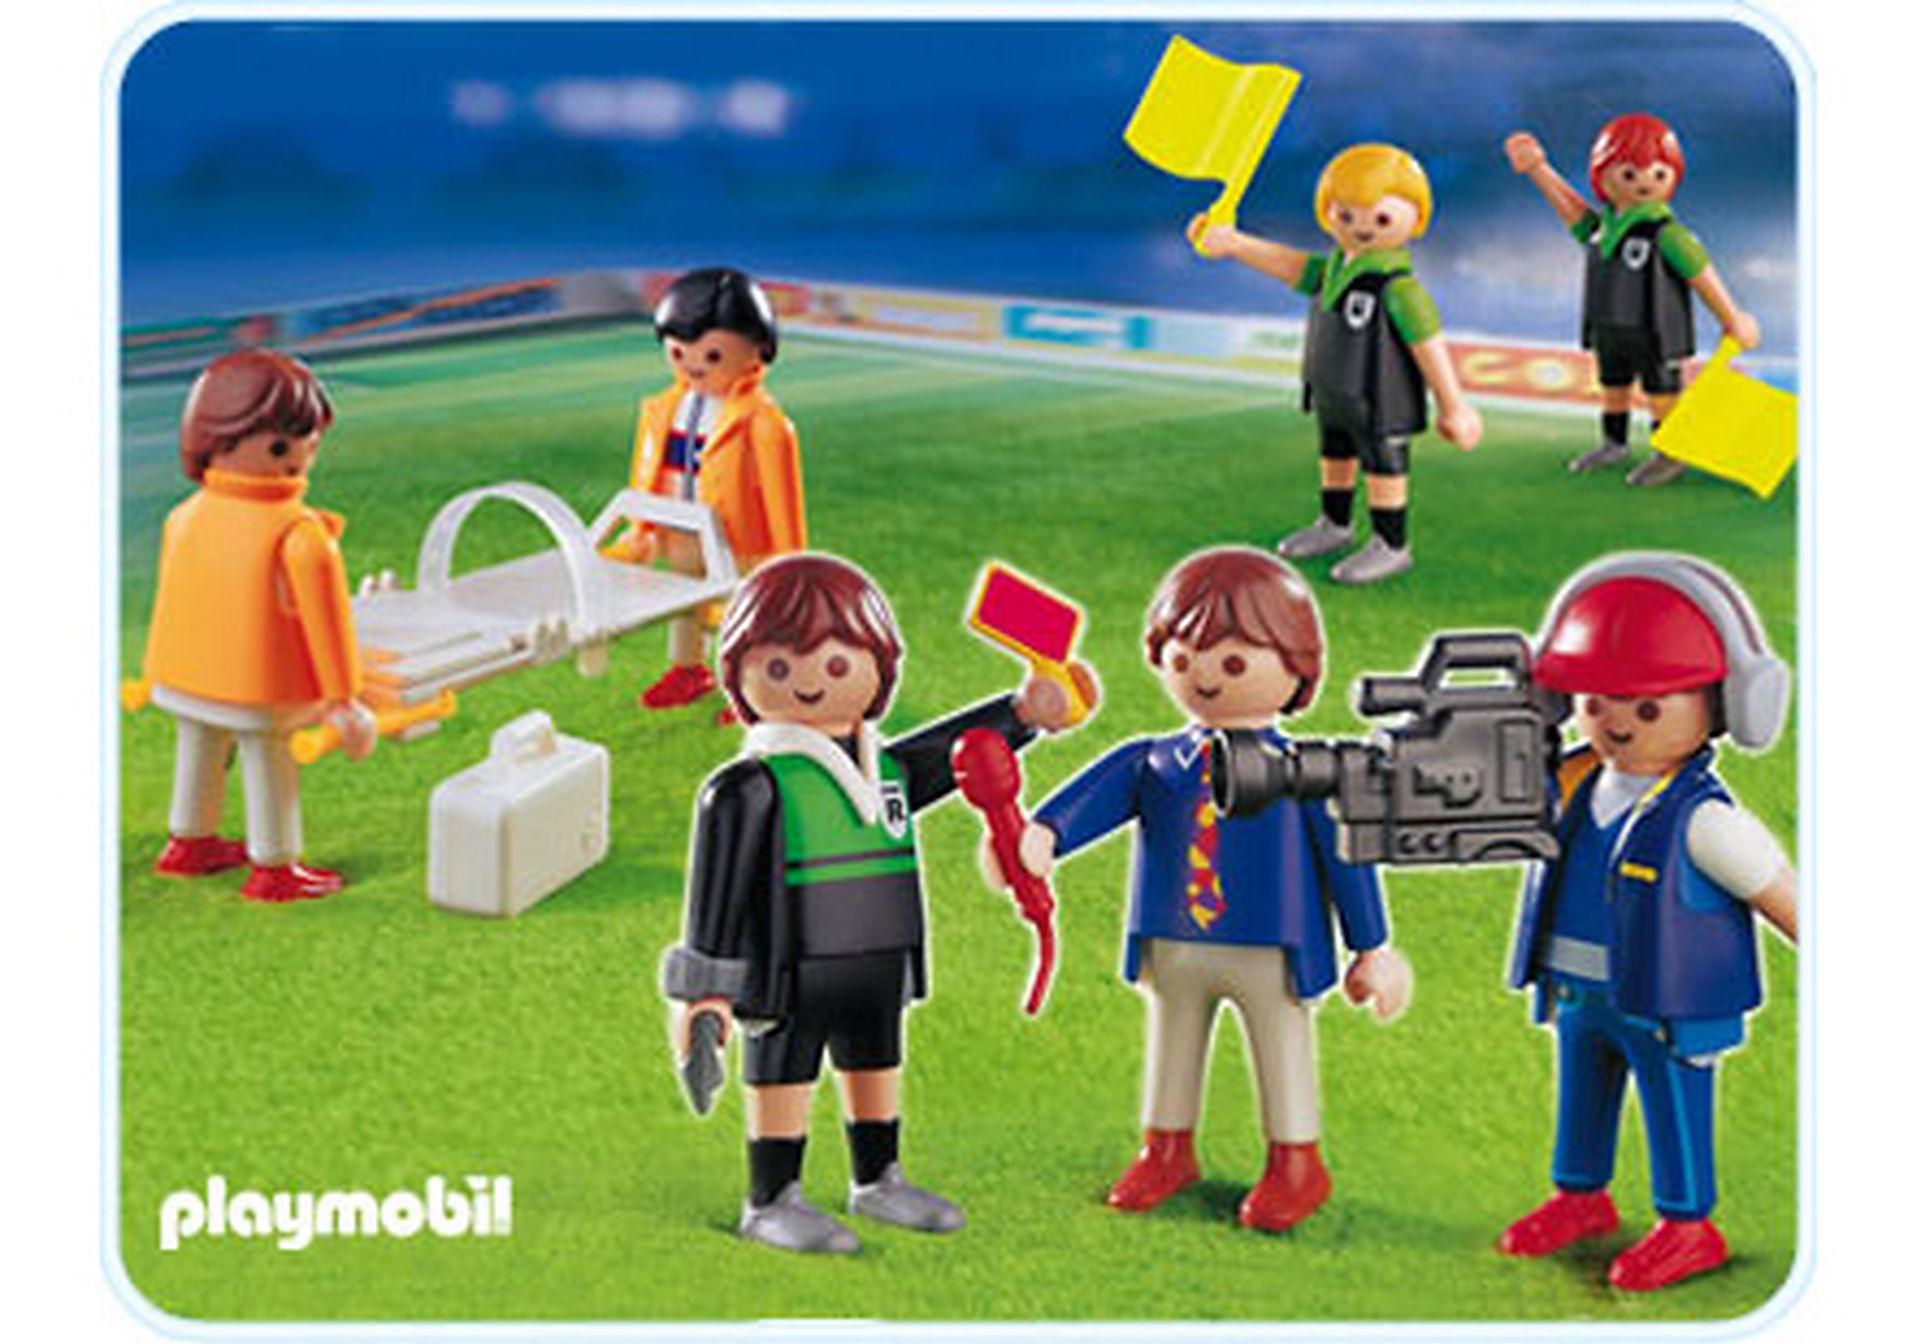 http://media.playmobil.com/i/playmobil/4717-A_product_detail/Fußballspiel-Ergänzungsset